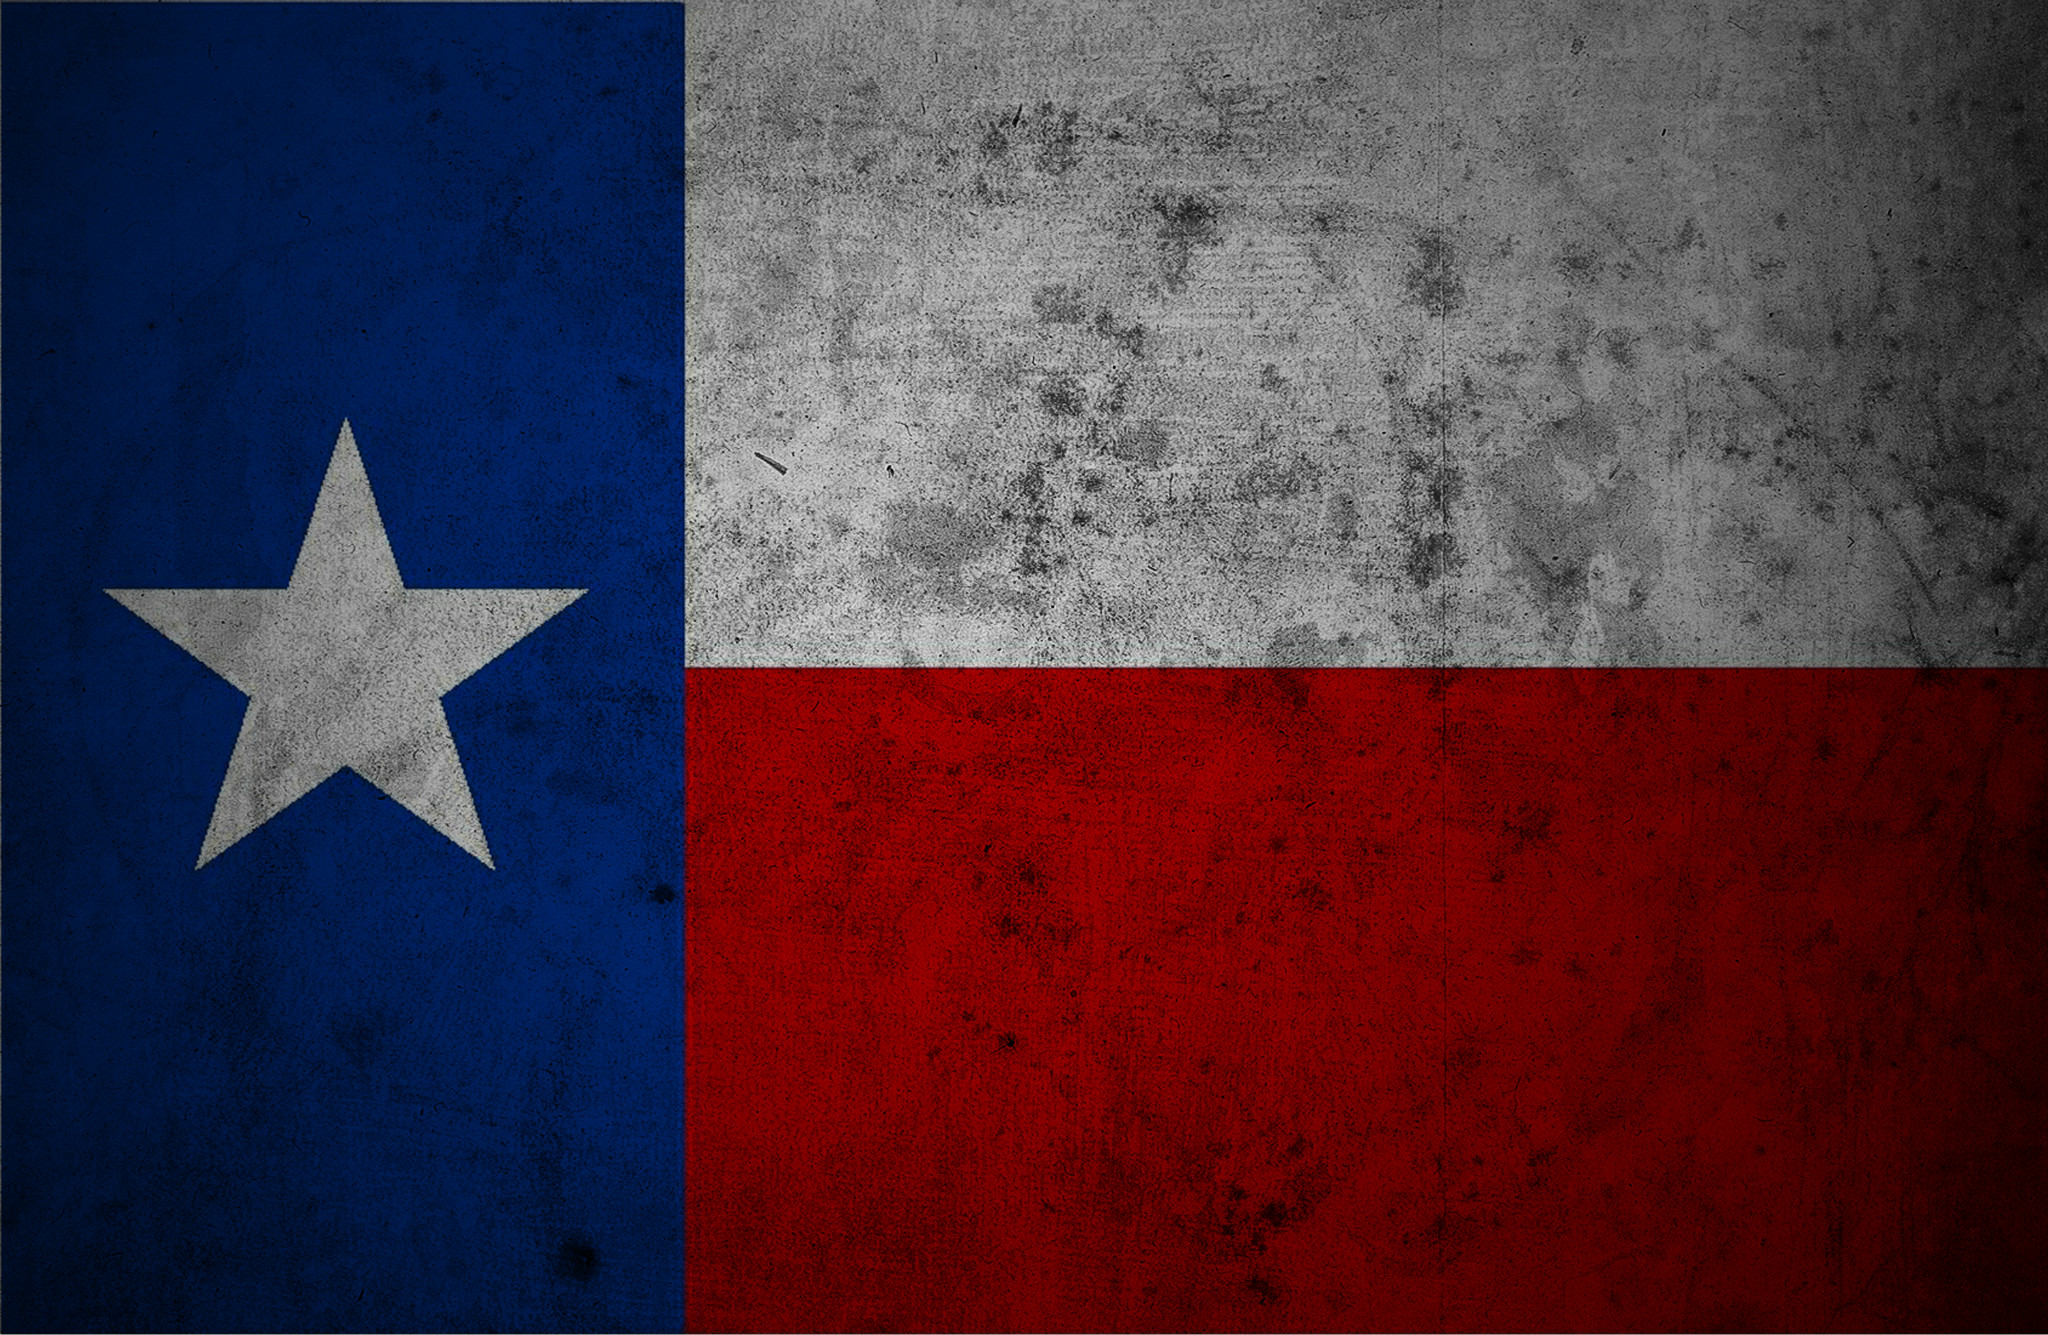 flags texas flag desktop 3000x1955 hd wallpaper 740450jpg 2048x1335